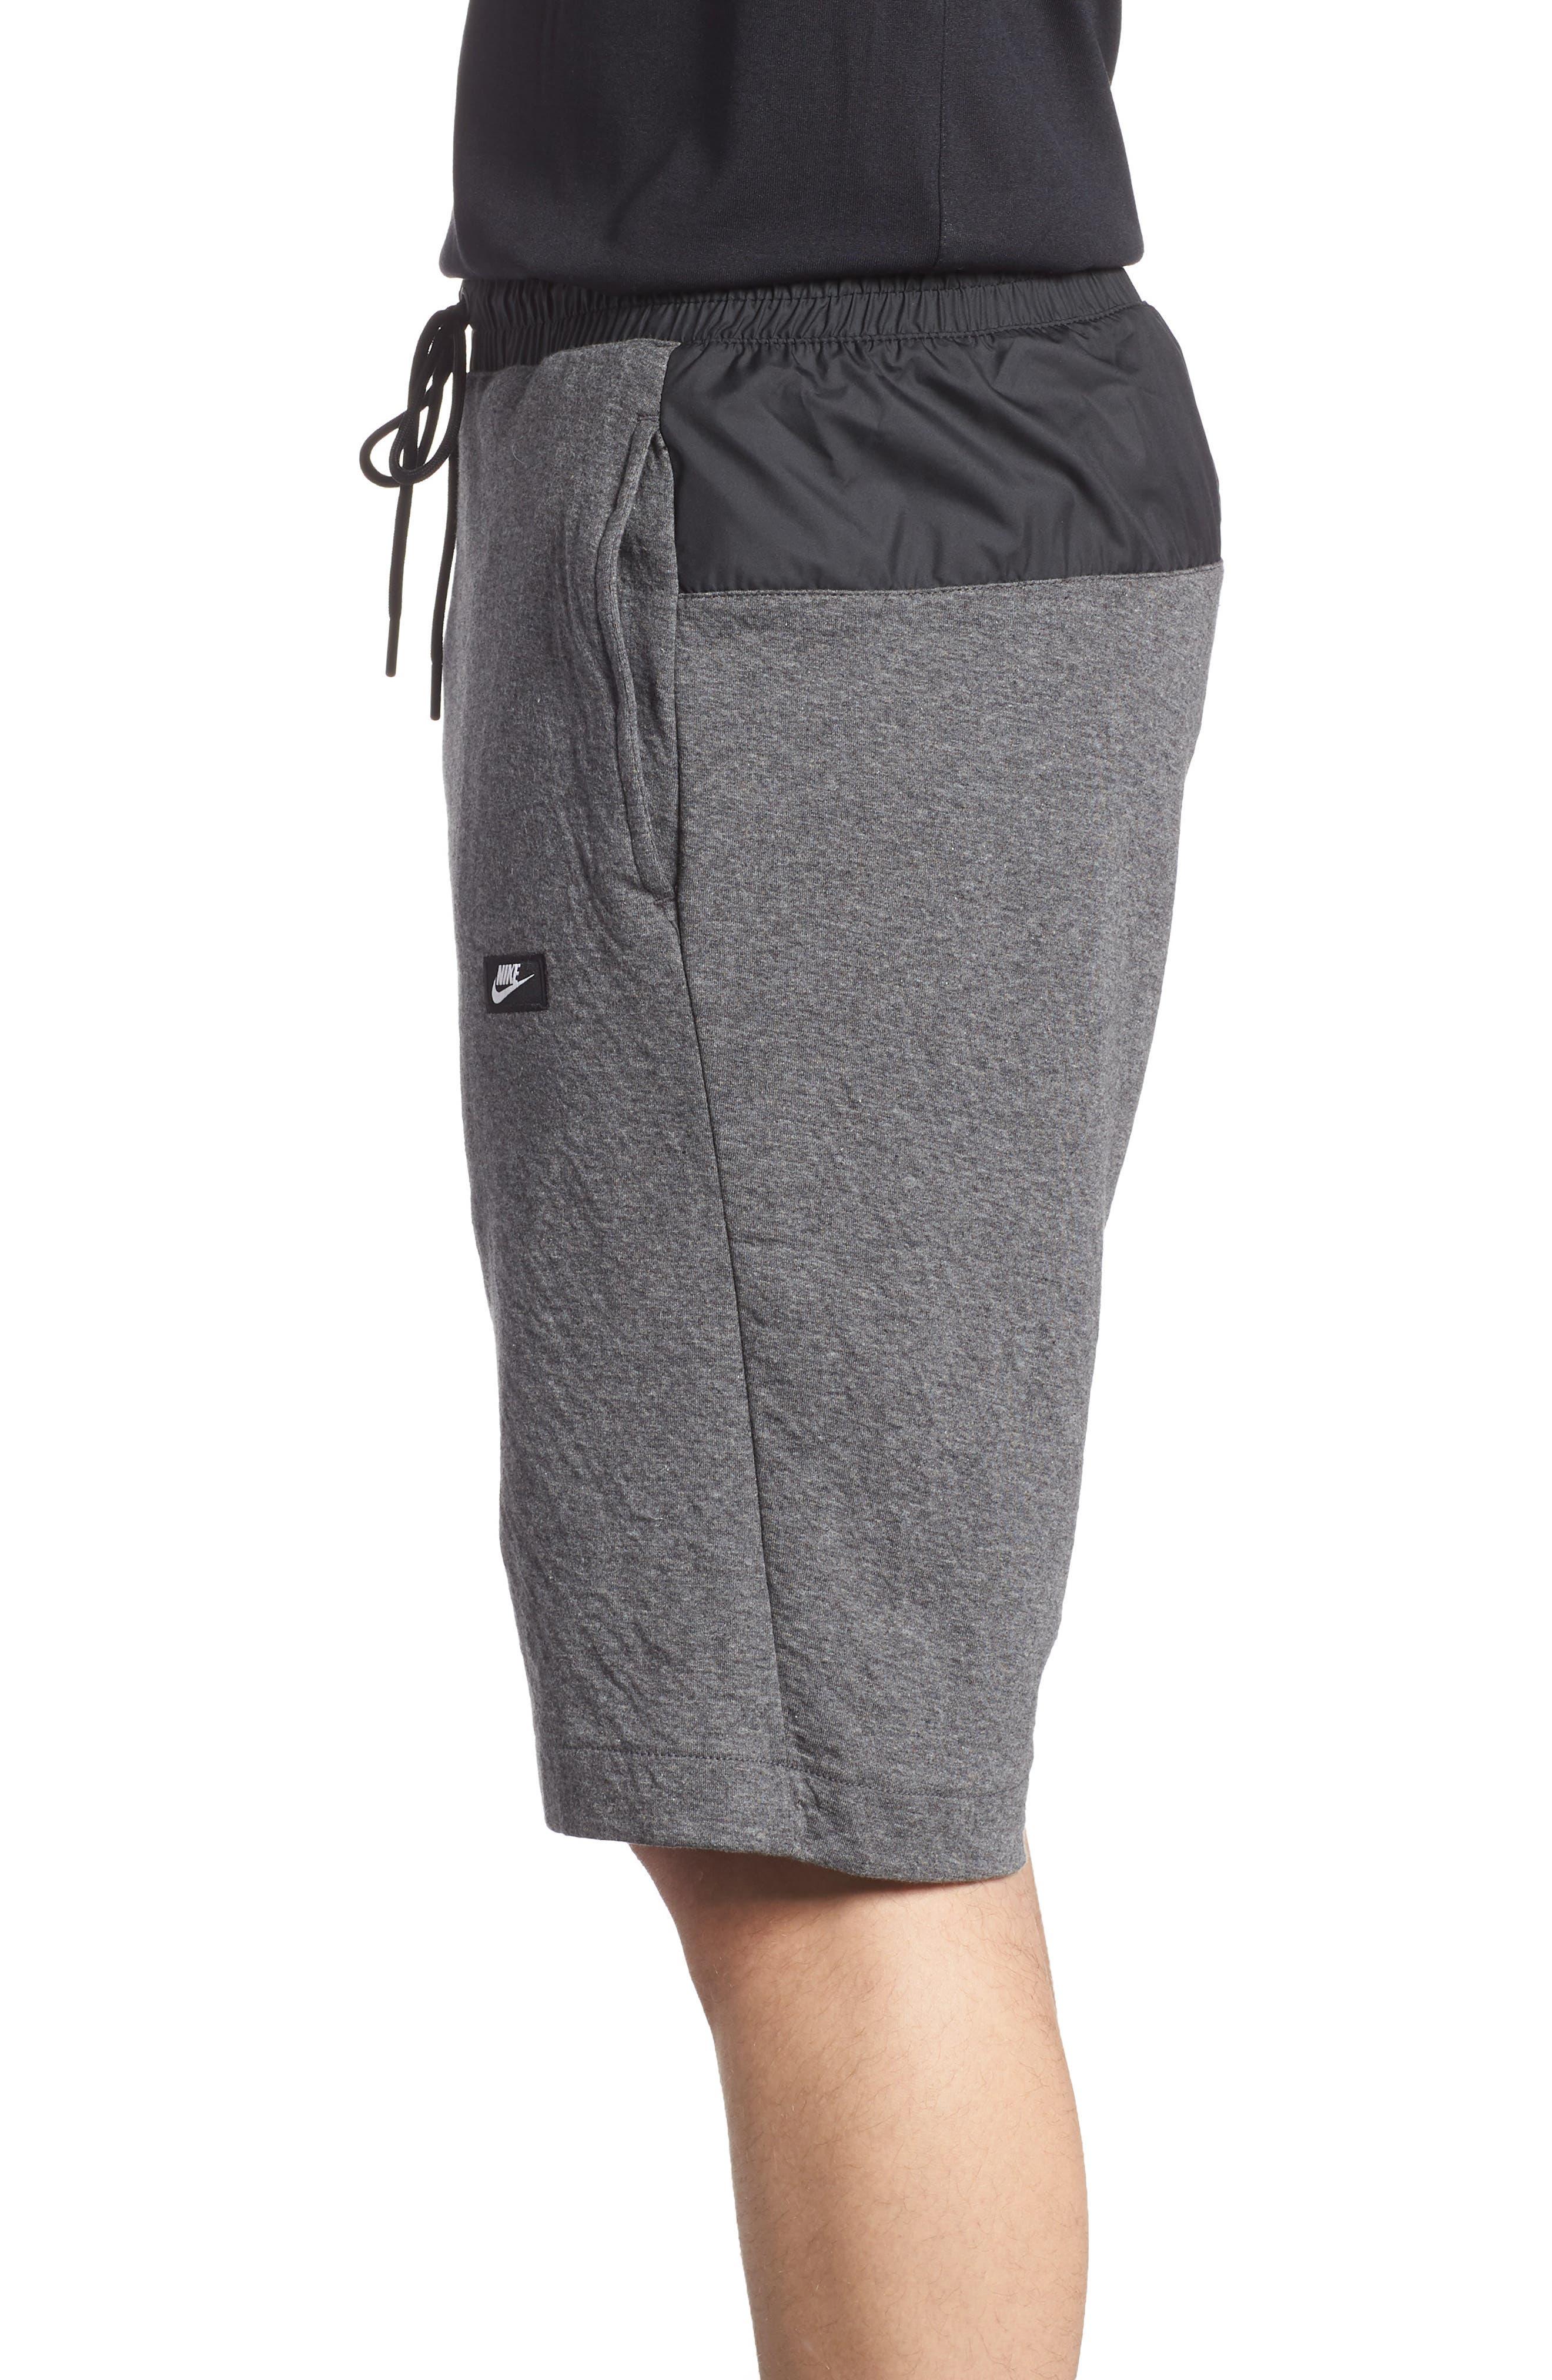 Sportswear Modern Shorts,                             Alternate thumbnail 3, color,                             Charcoal Heather/ Black